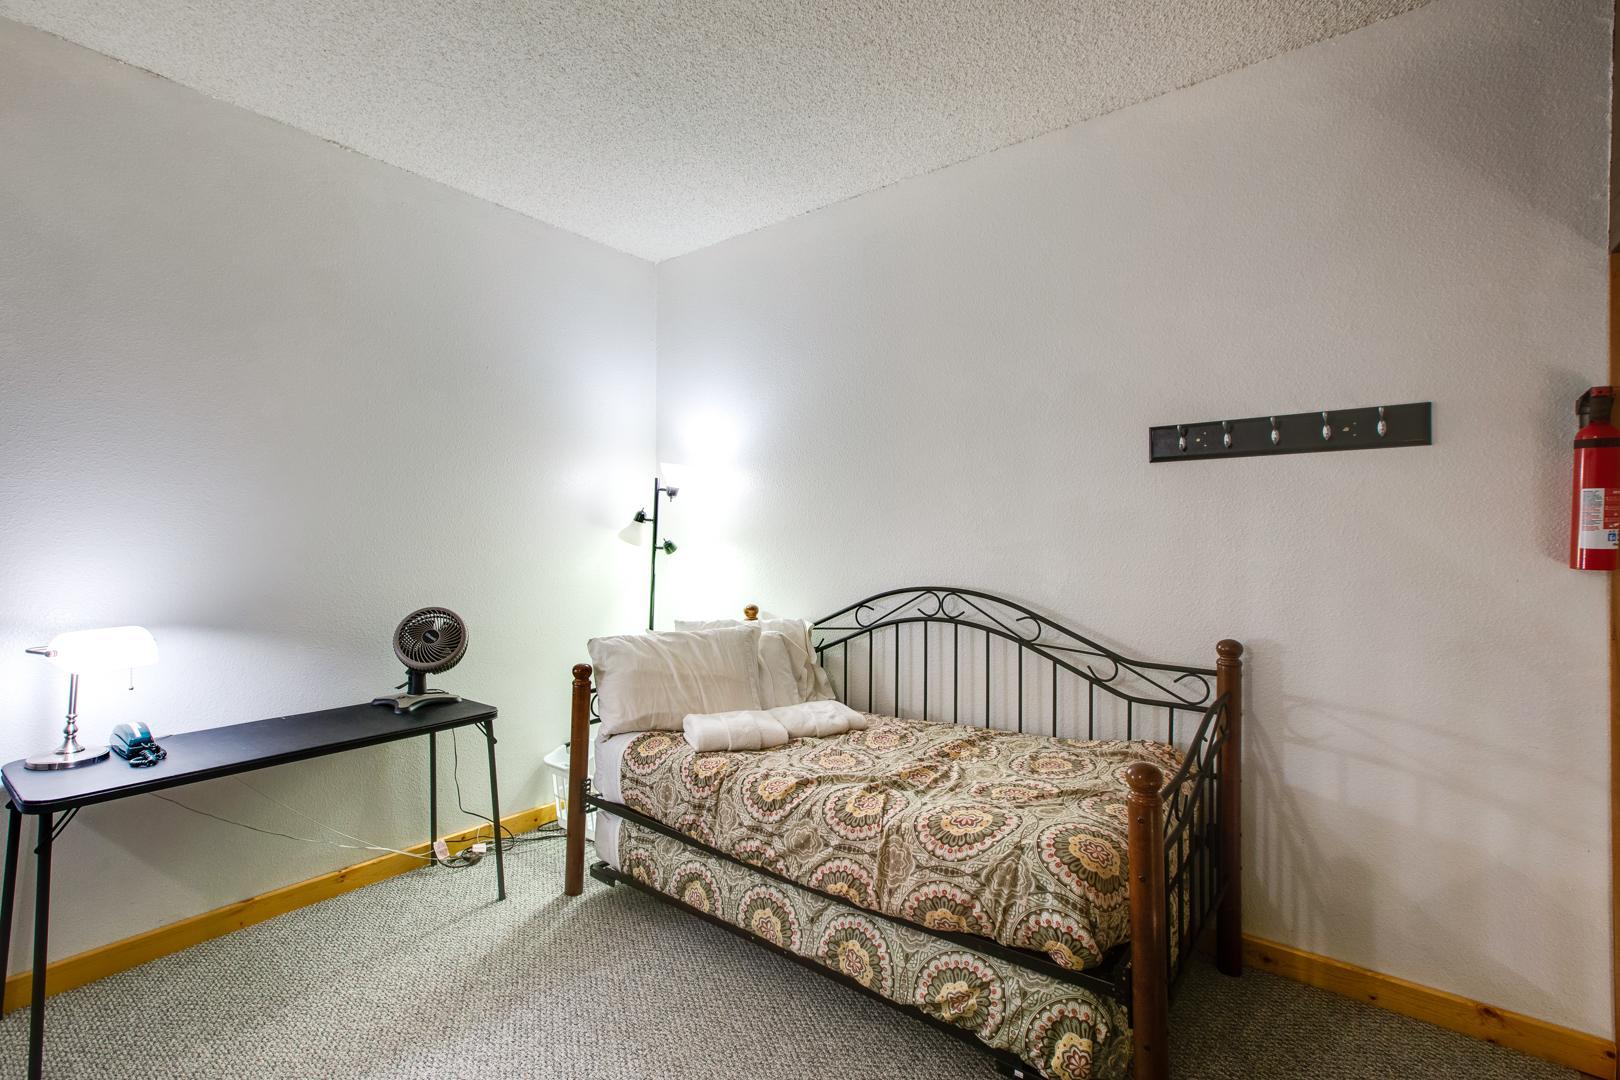 Apartment Mt  Baker Lodging Condo  56     FIREPLACE  INEXPENSIVE  KITCHENETTE  WIFI  SLEEPS-4  photo 31816885